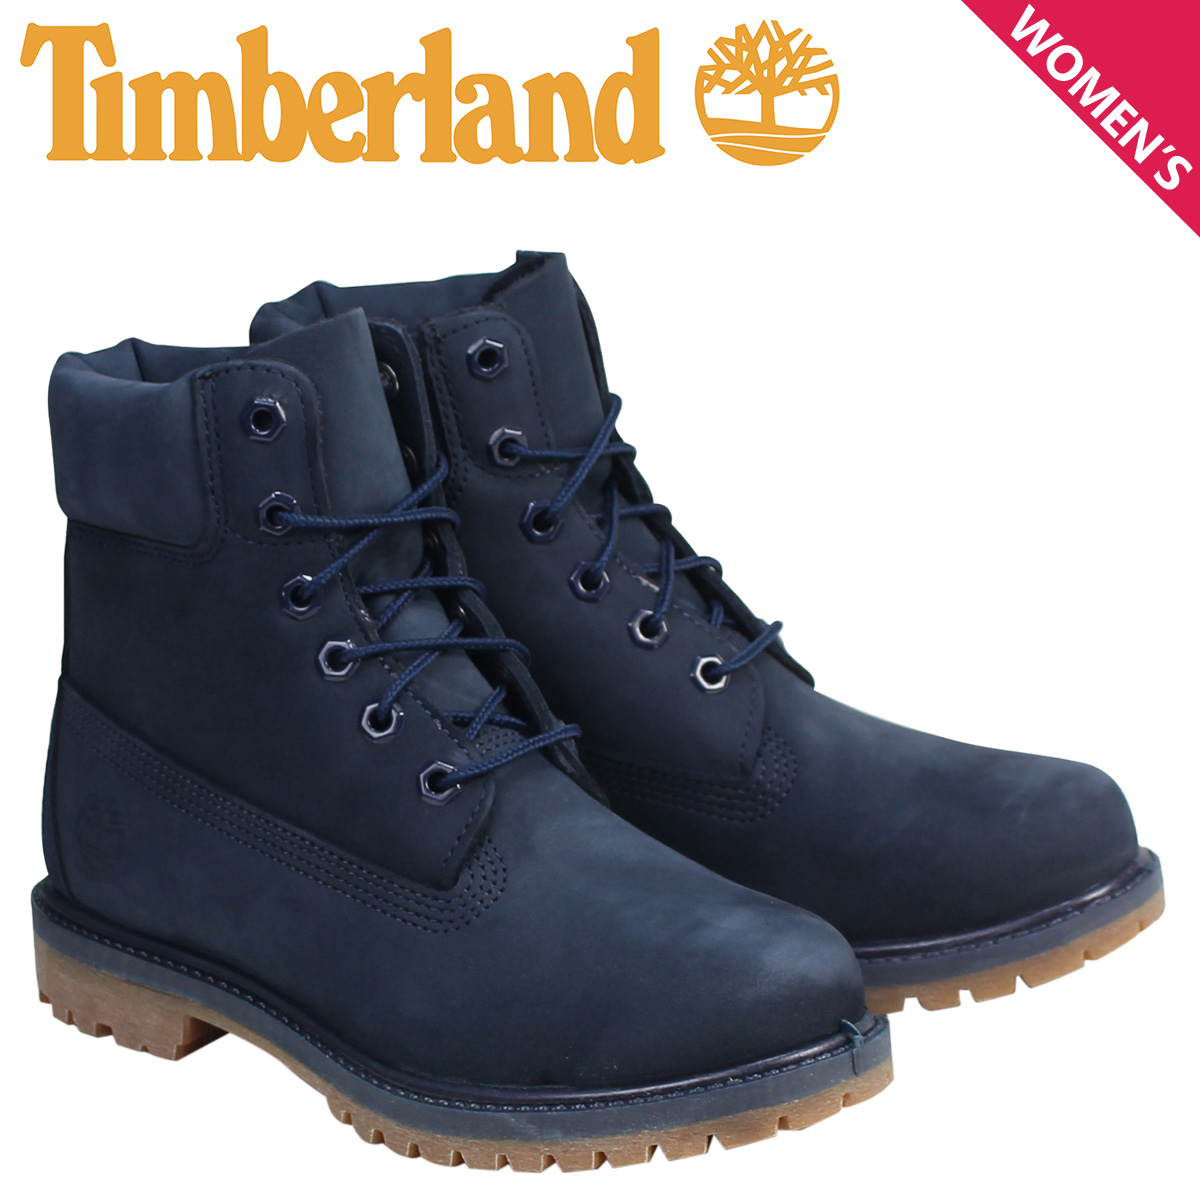 Timberland 6インチ レディース ティンバーランド ブーツ 6INCHI PREMIUM WATERPROOF BOOTS A1K41 Wワイズ 防水 ネイビー